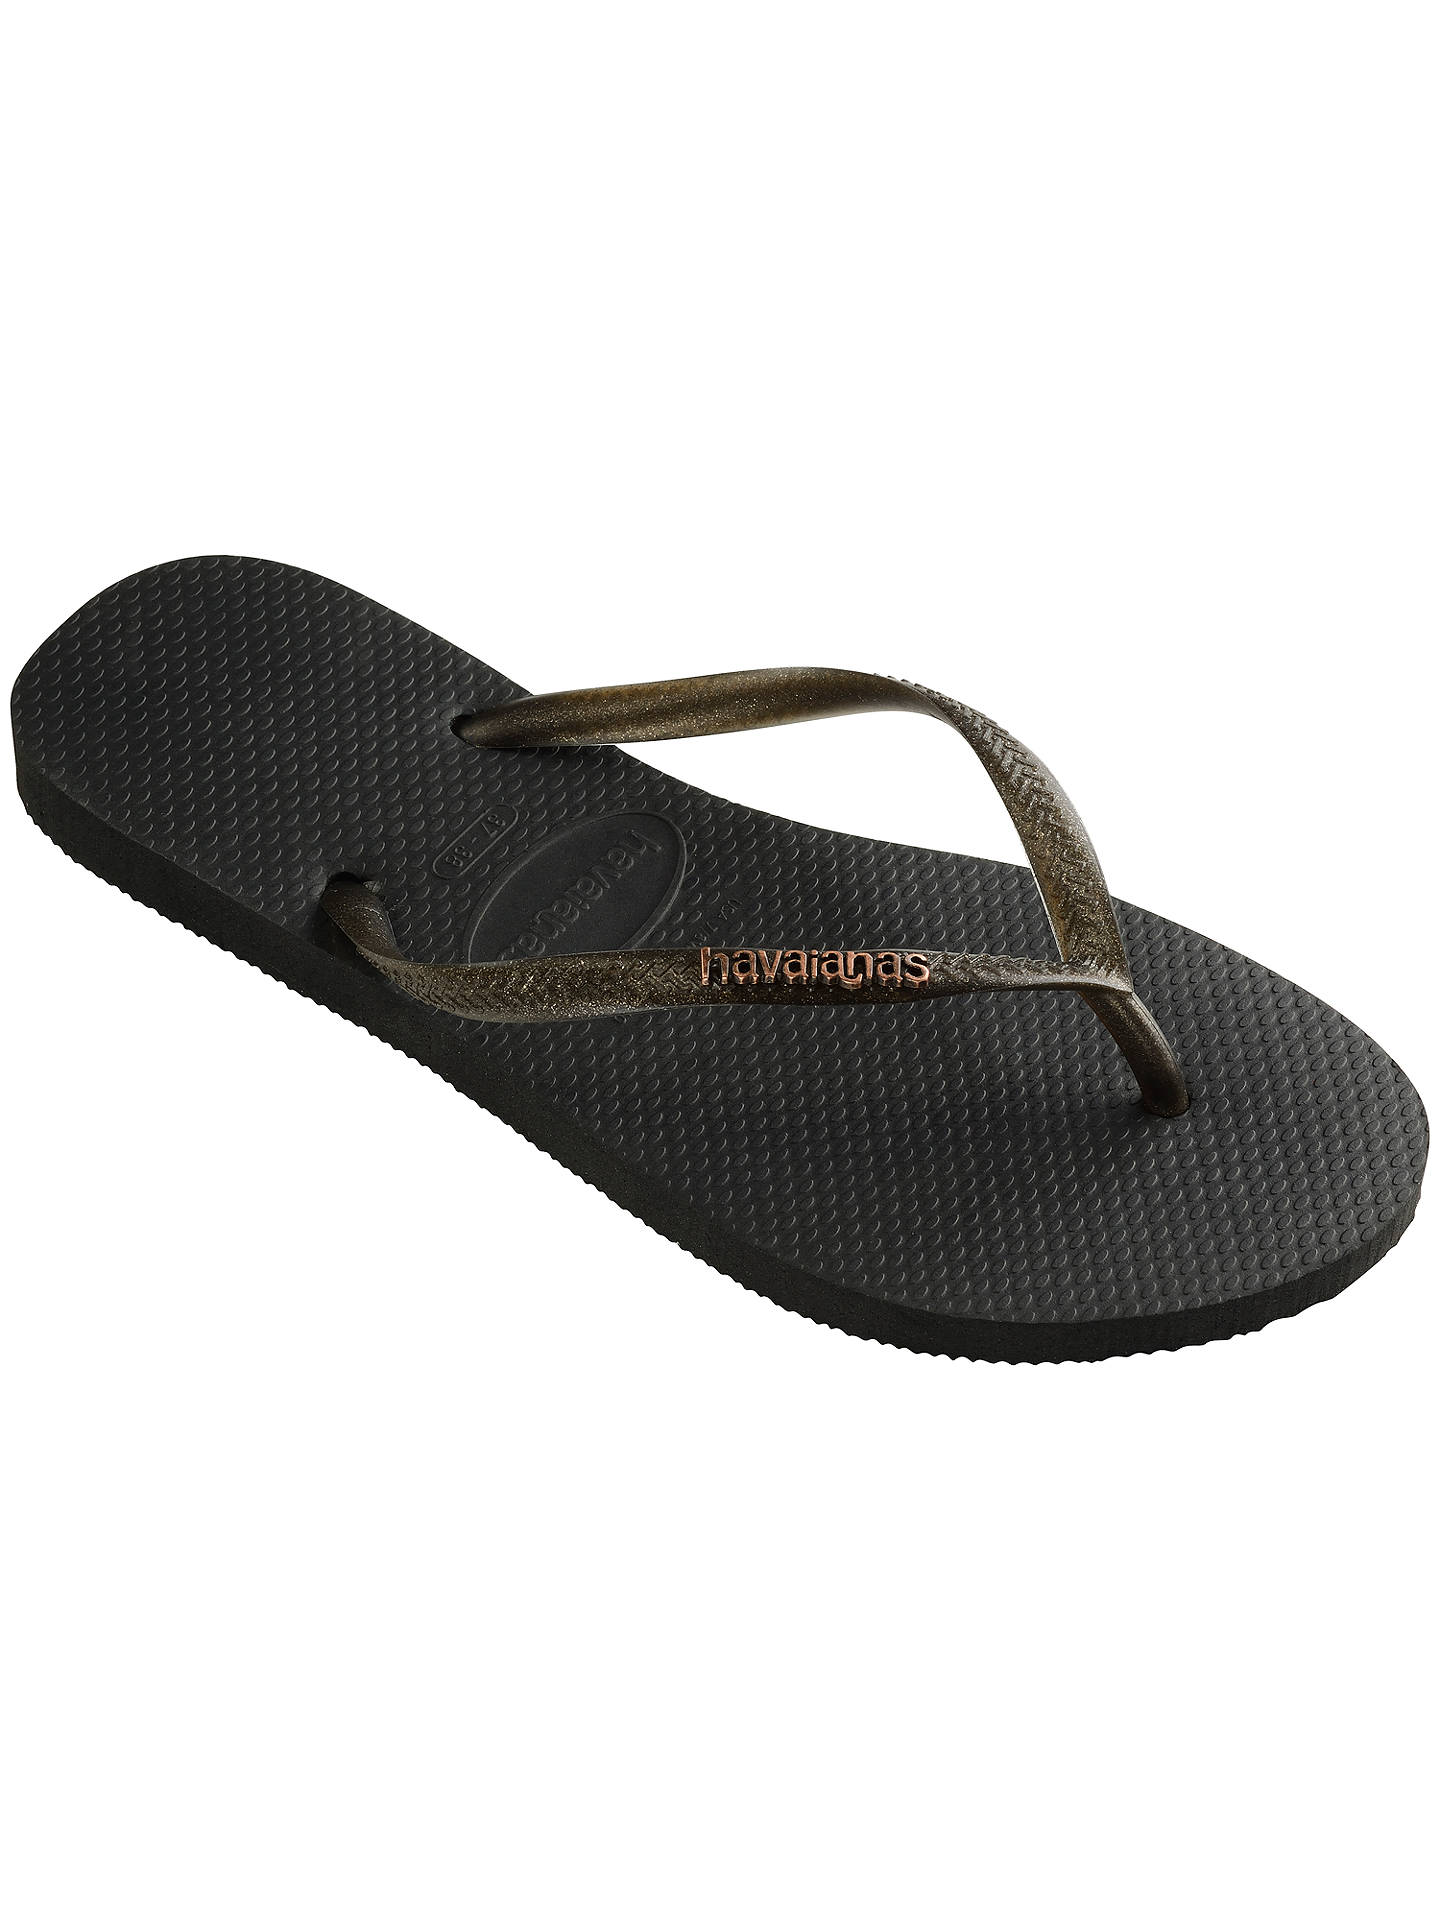 3170bc59f49da3 Buy Havaianas Slim Logo Flip Flops